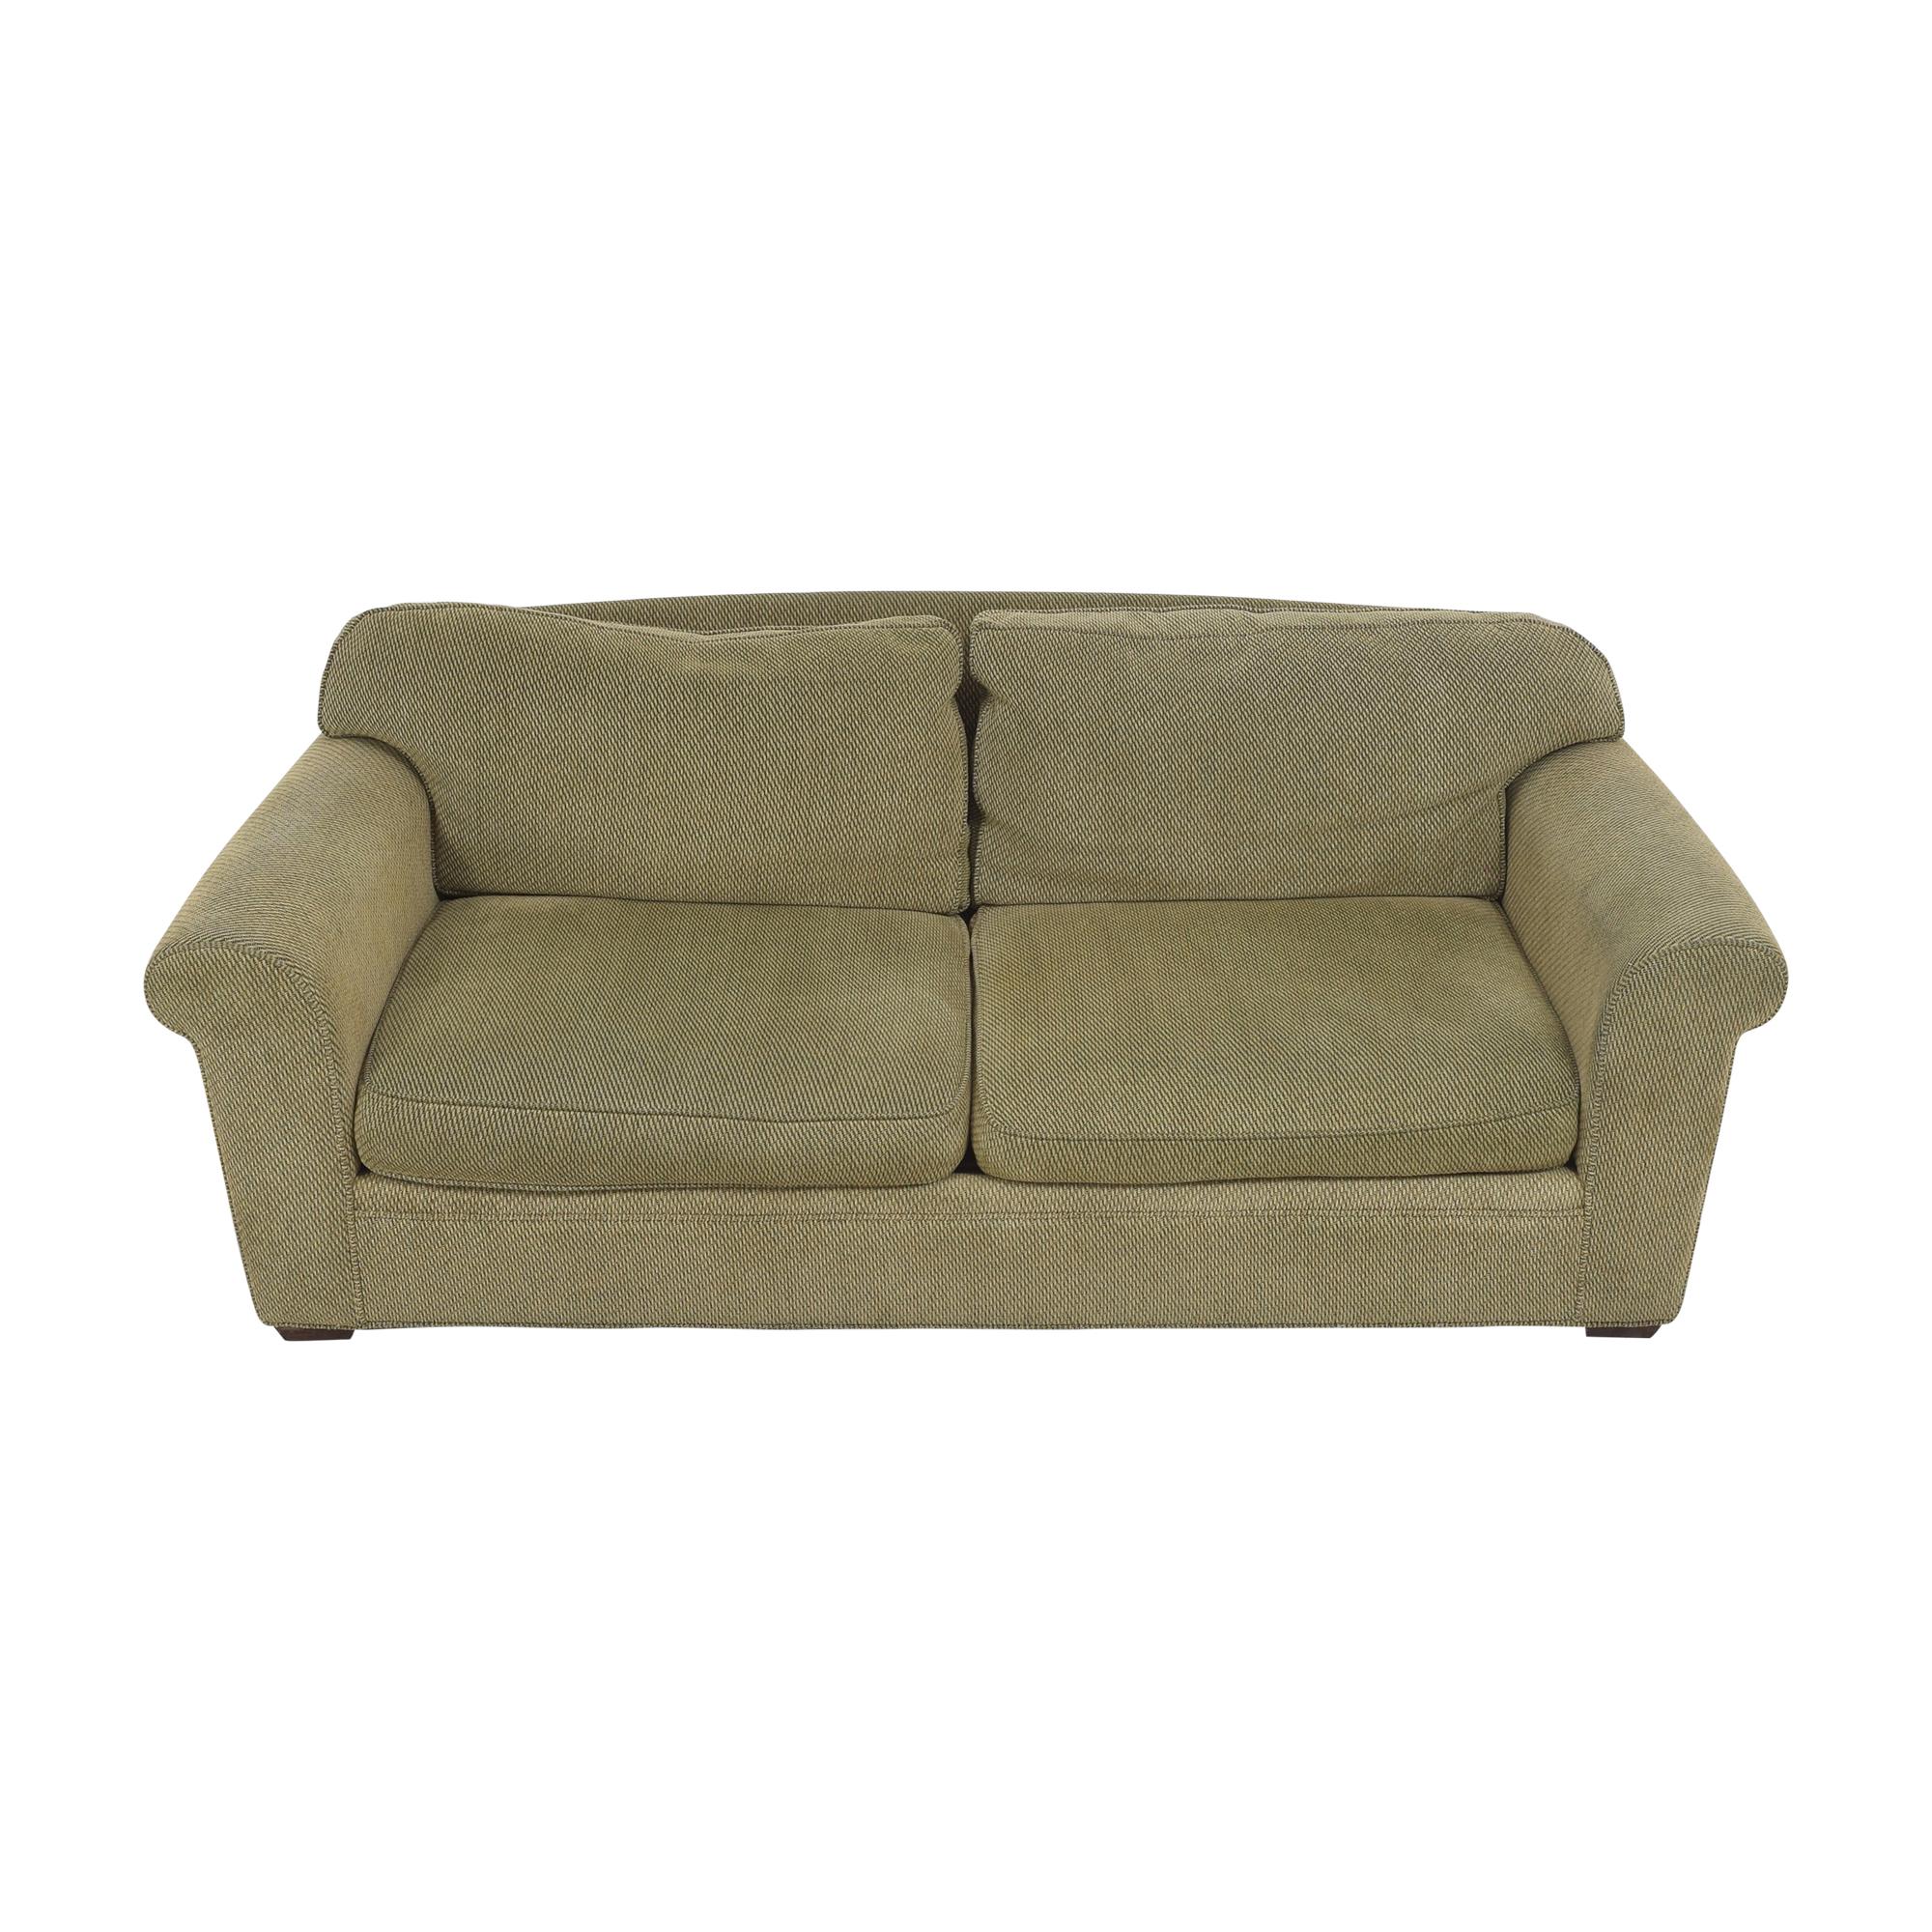 Crate & Barrel Crate & Barrel Two Cushion Sofa nyc